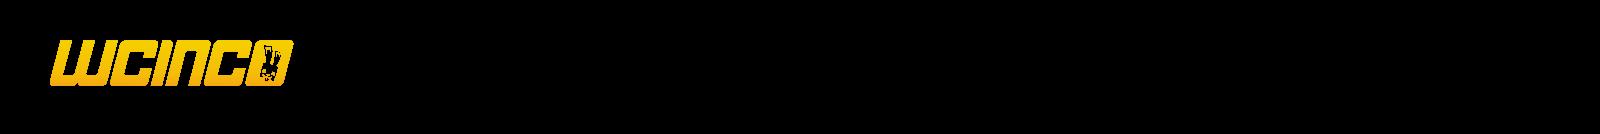 WCINCO.net